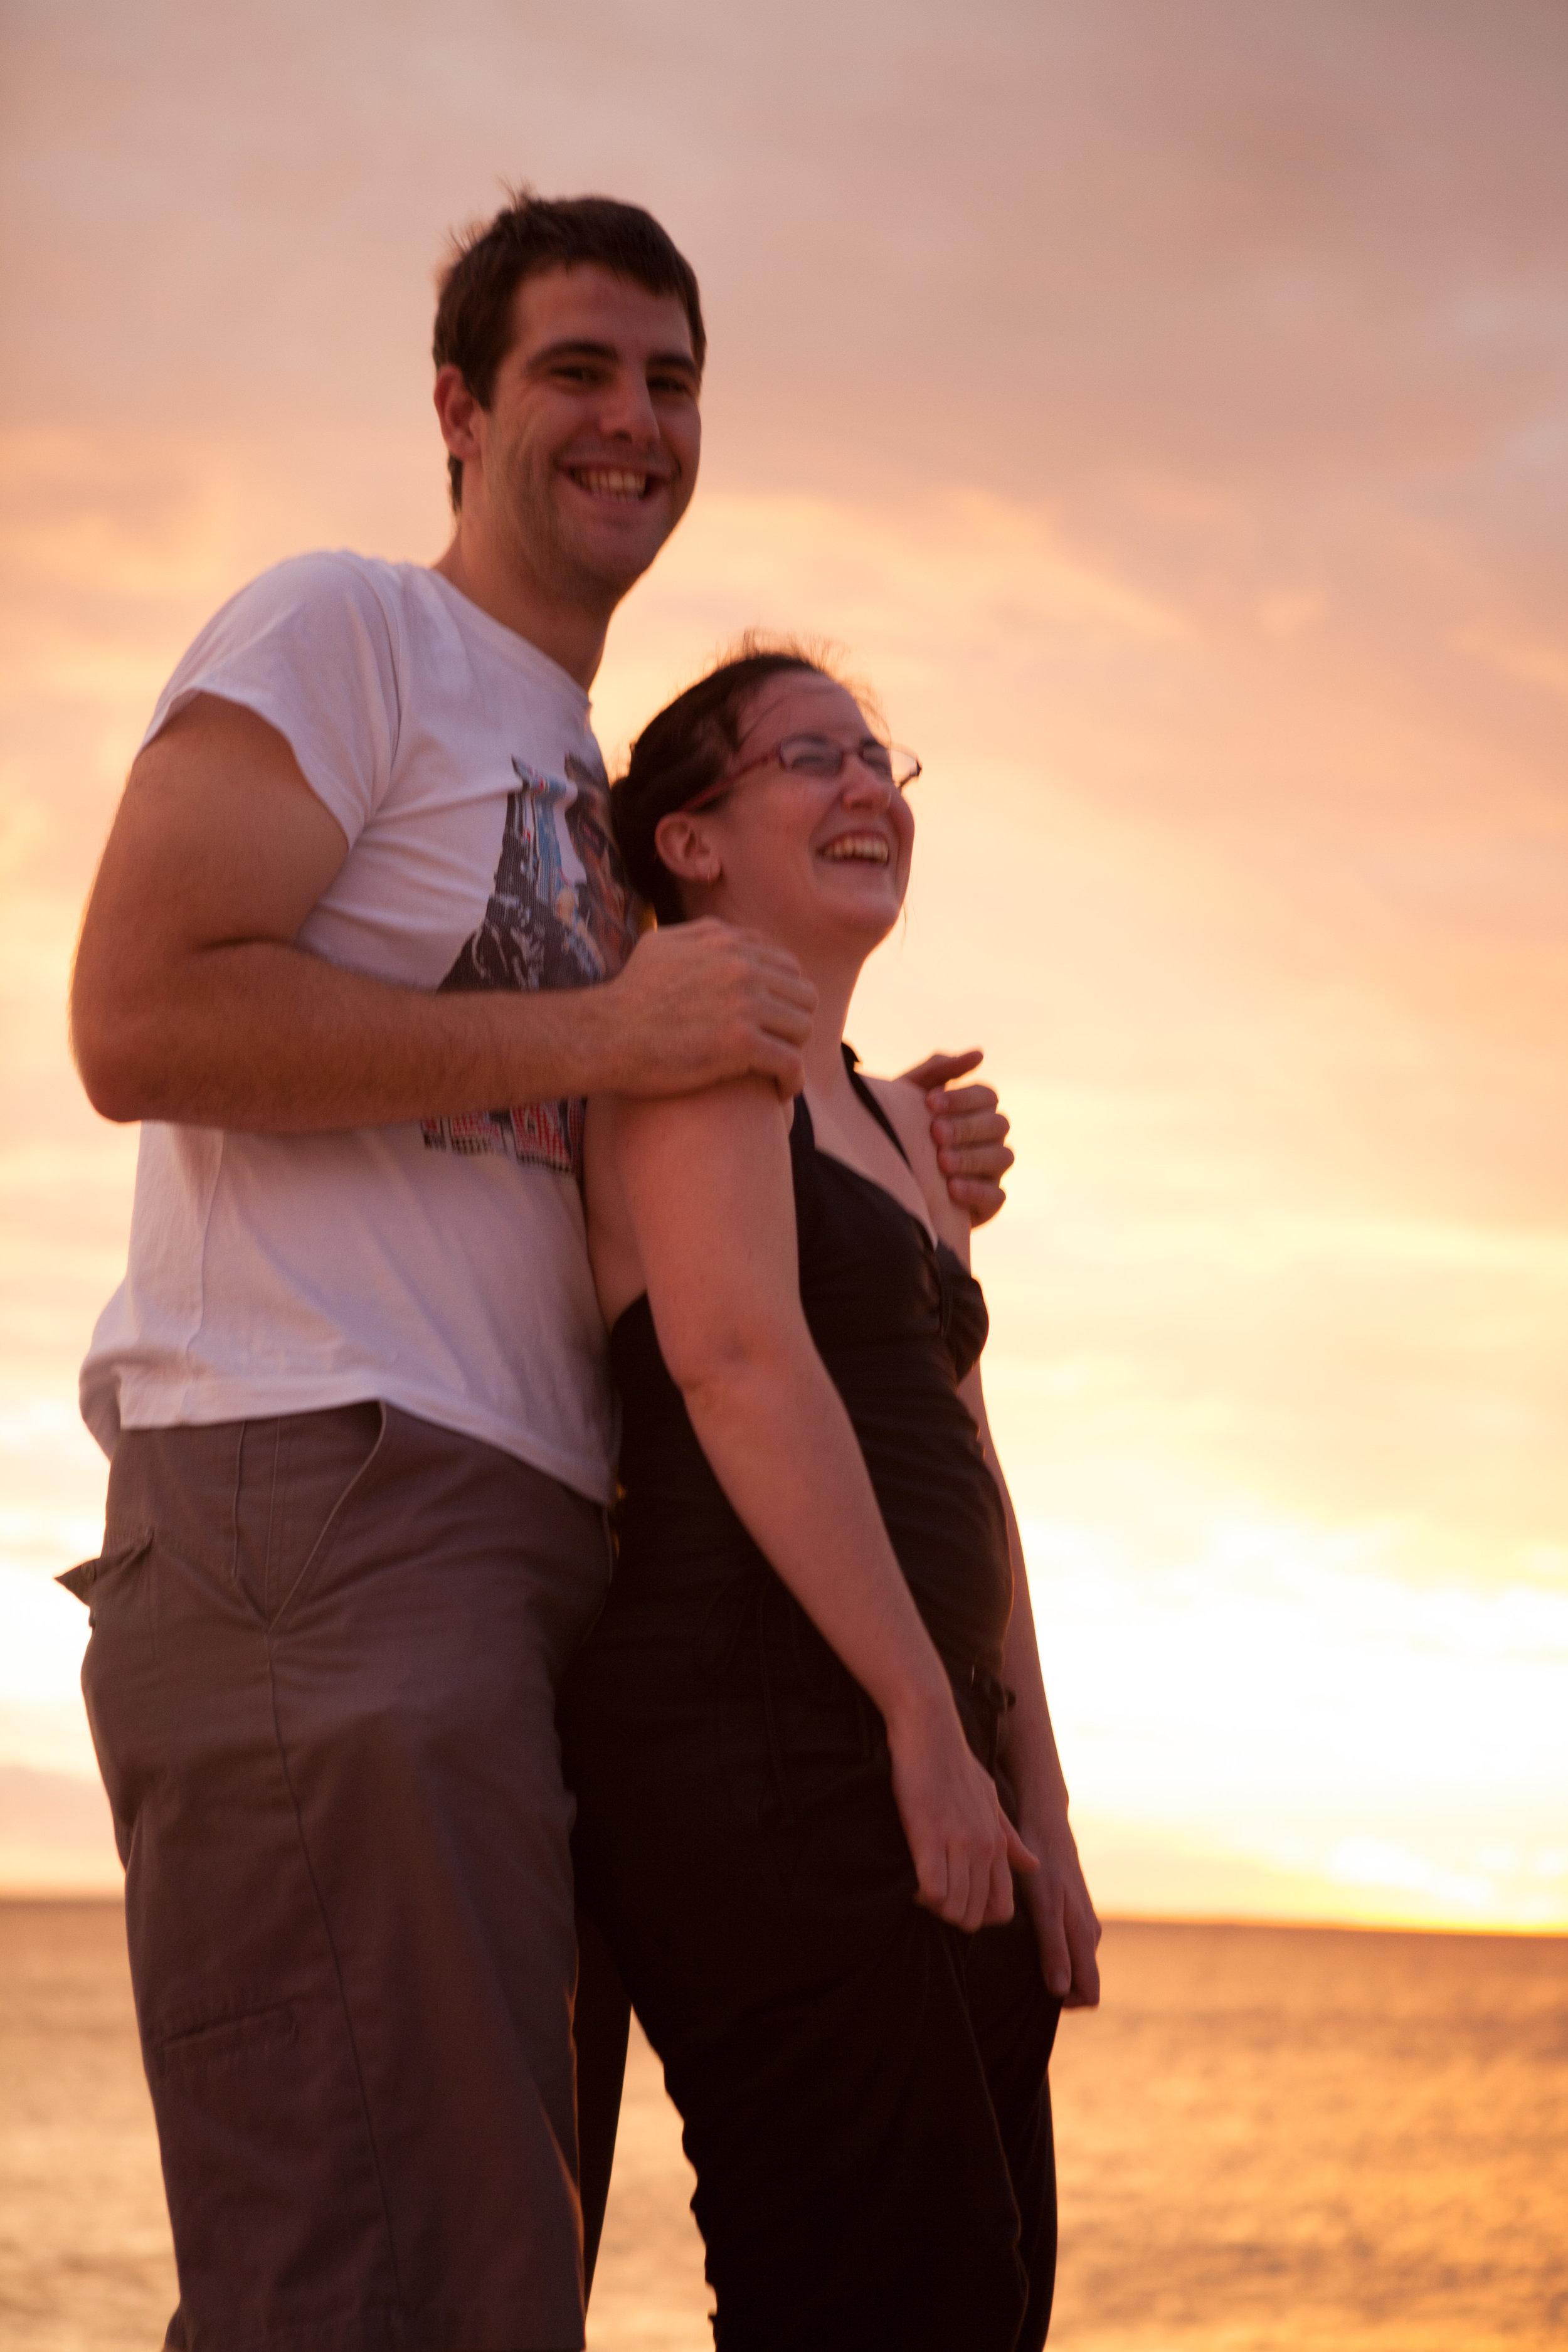 Suzanne's Birthday at Floreat Beach 69 - 2011-02-20 at 19-03-48.jpg